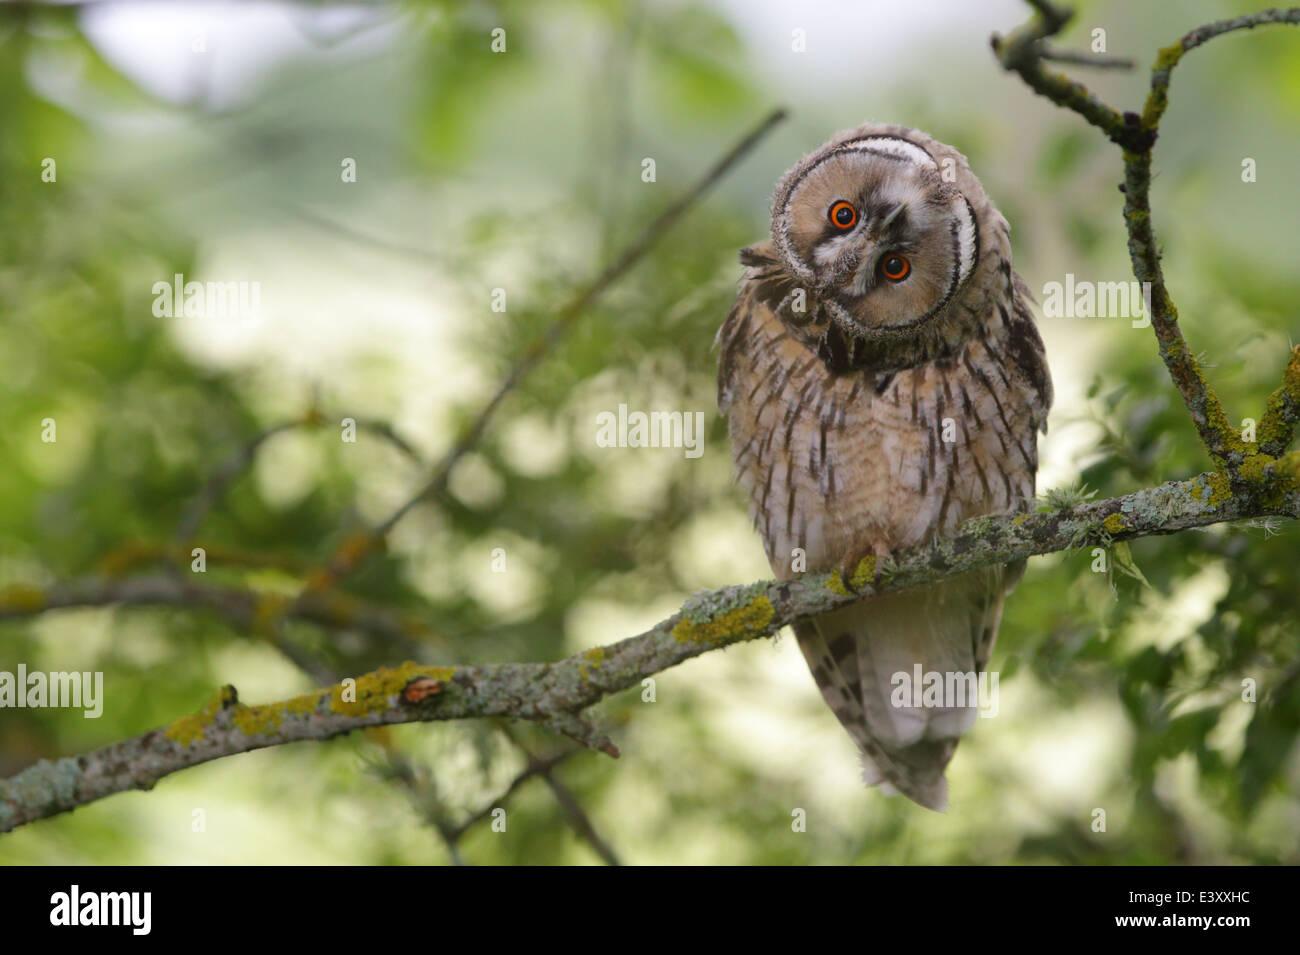 Long-eared Owl twisting his head, Europe - Stock Image